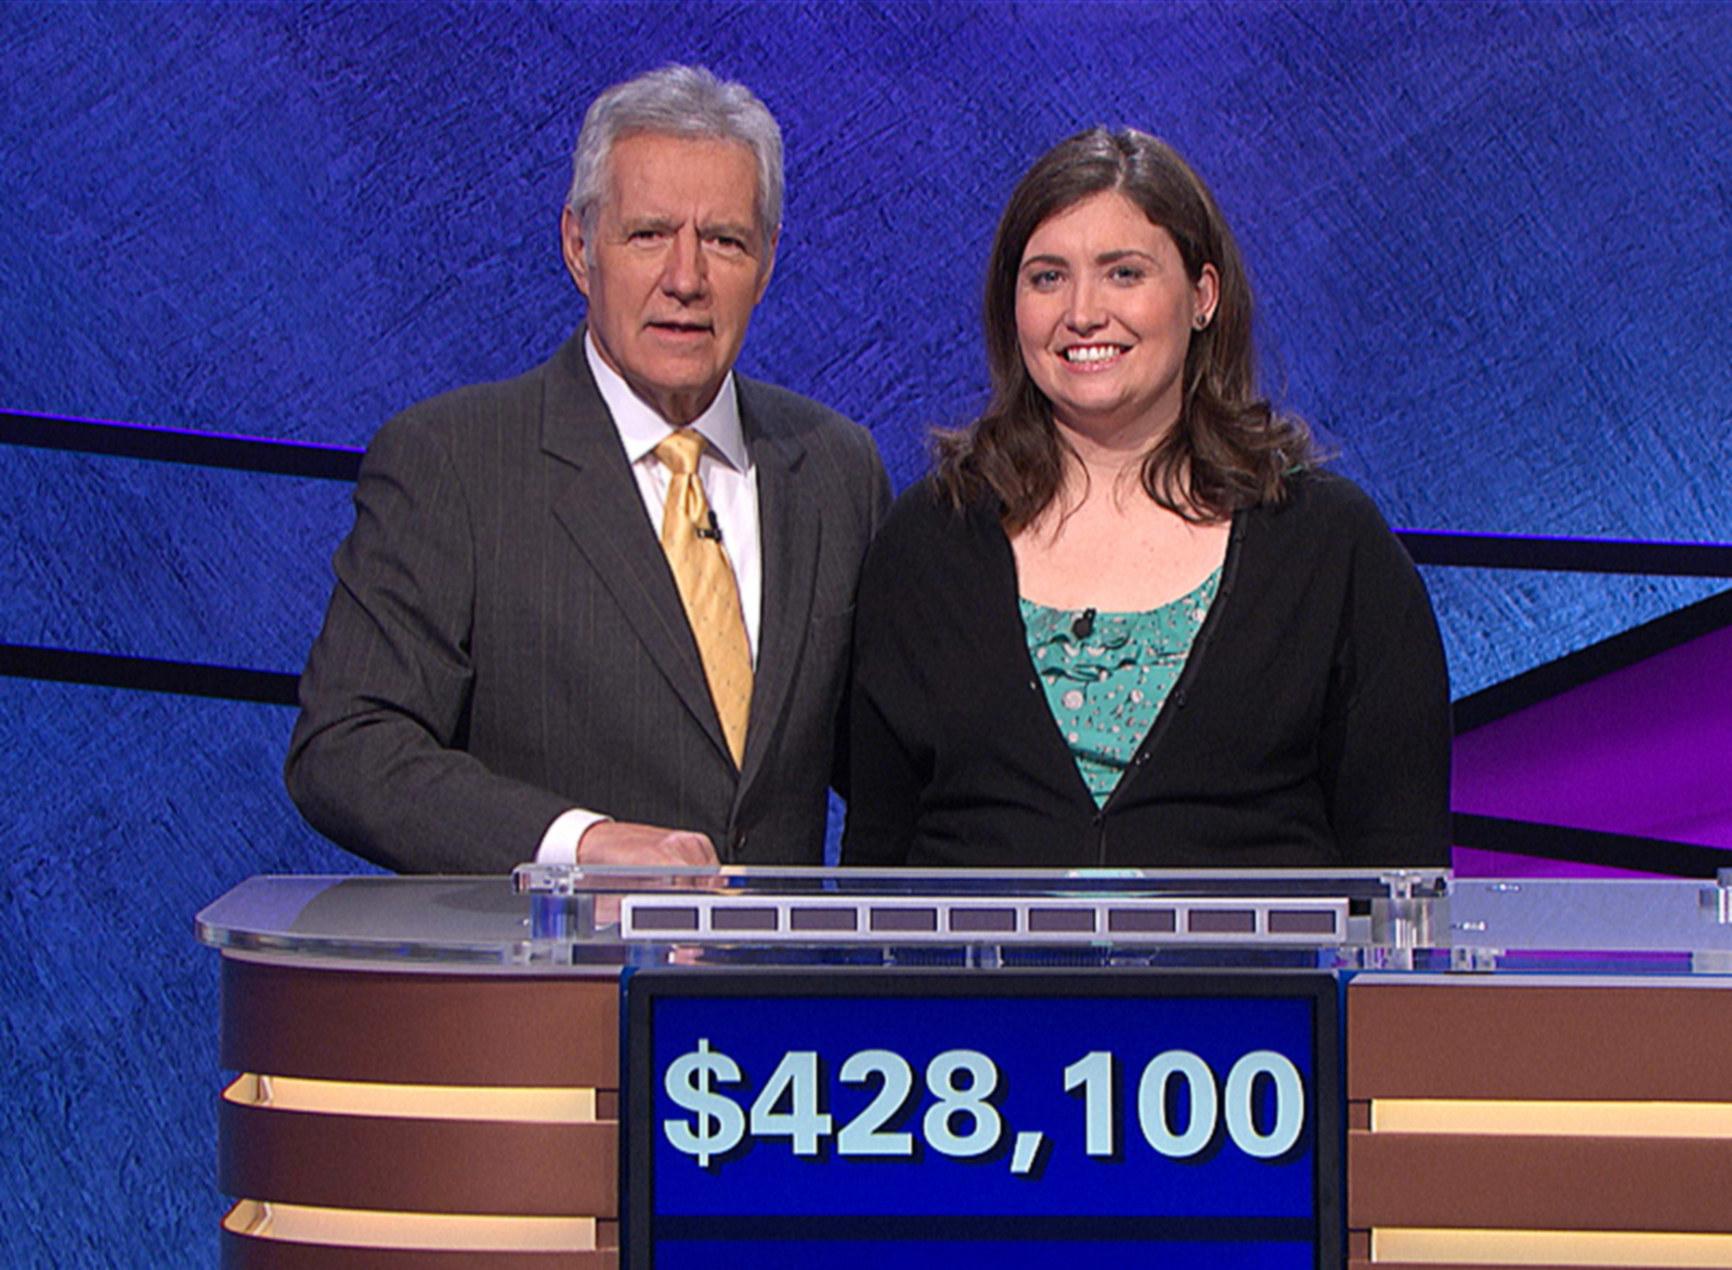 Jeopardy host Alex Trebek, contestant Julia Collins